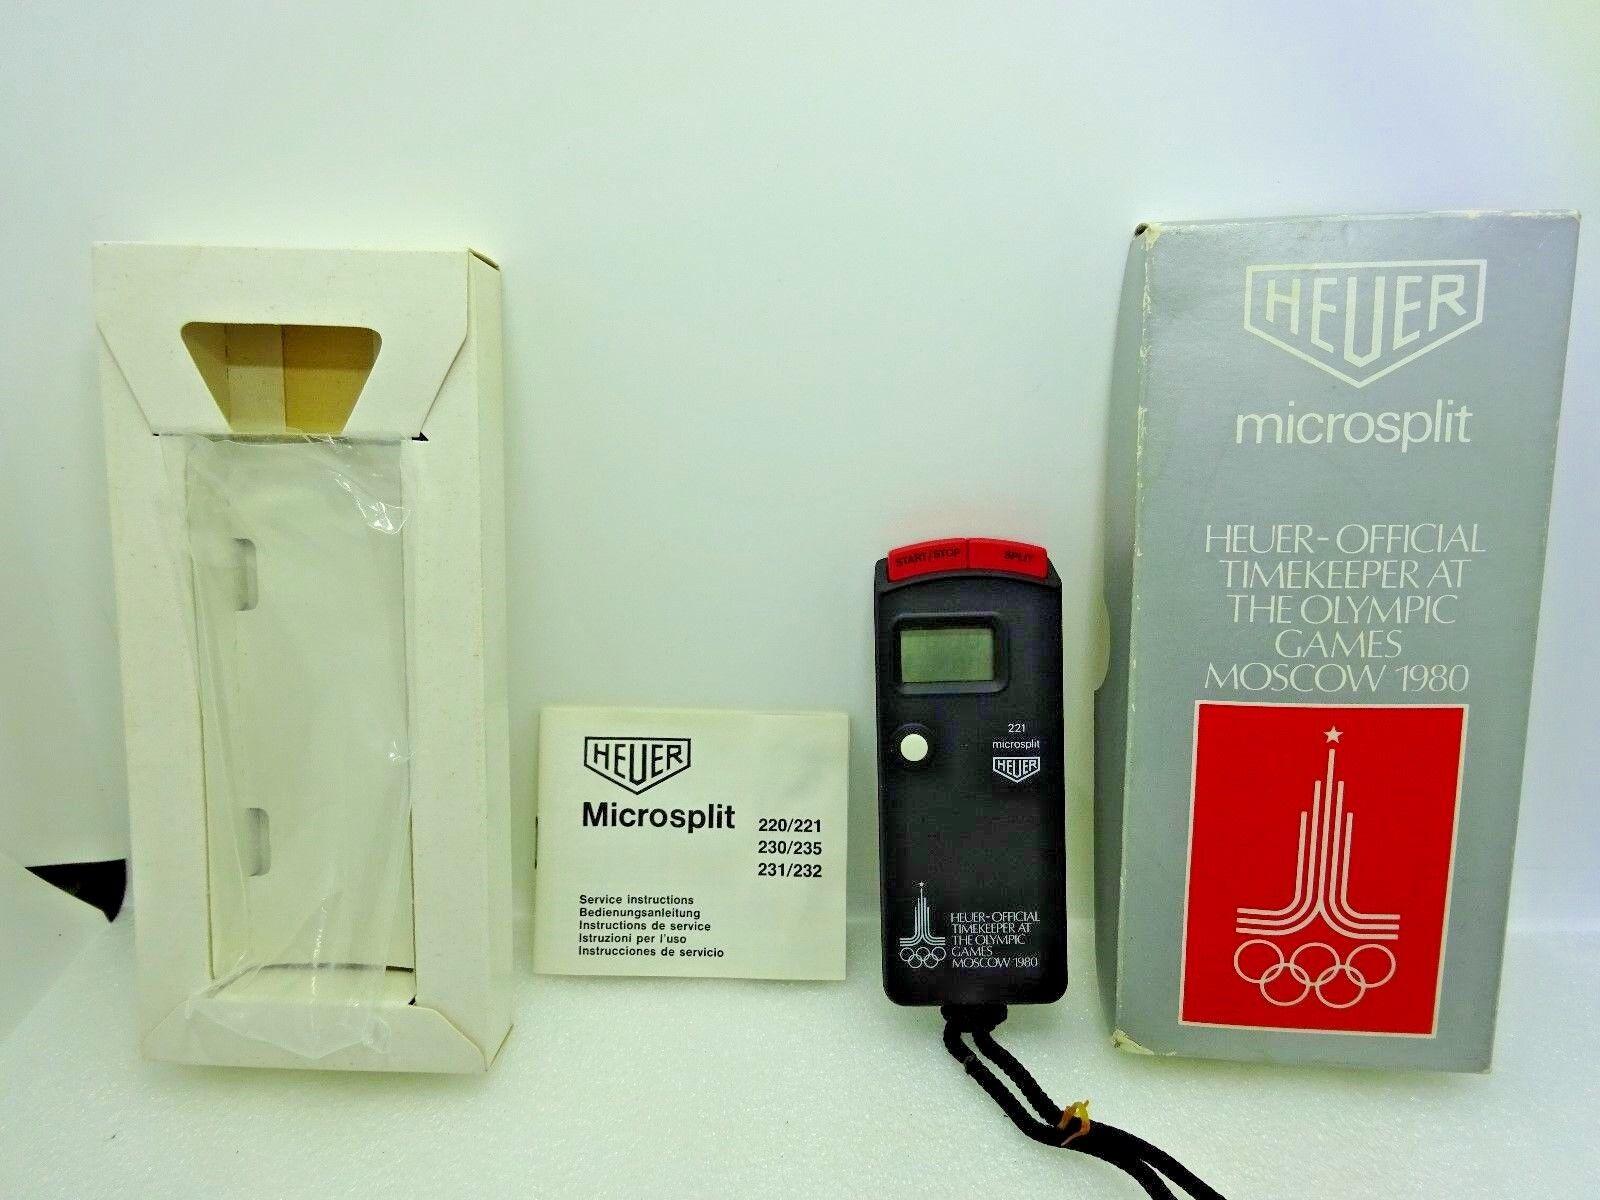 NOS Vintage Heuer MS 221 Microsplit Stopwatch Moscow 1980 Summer Olympics Editio